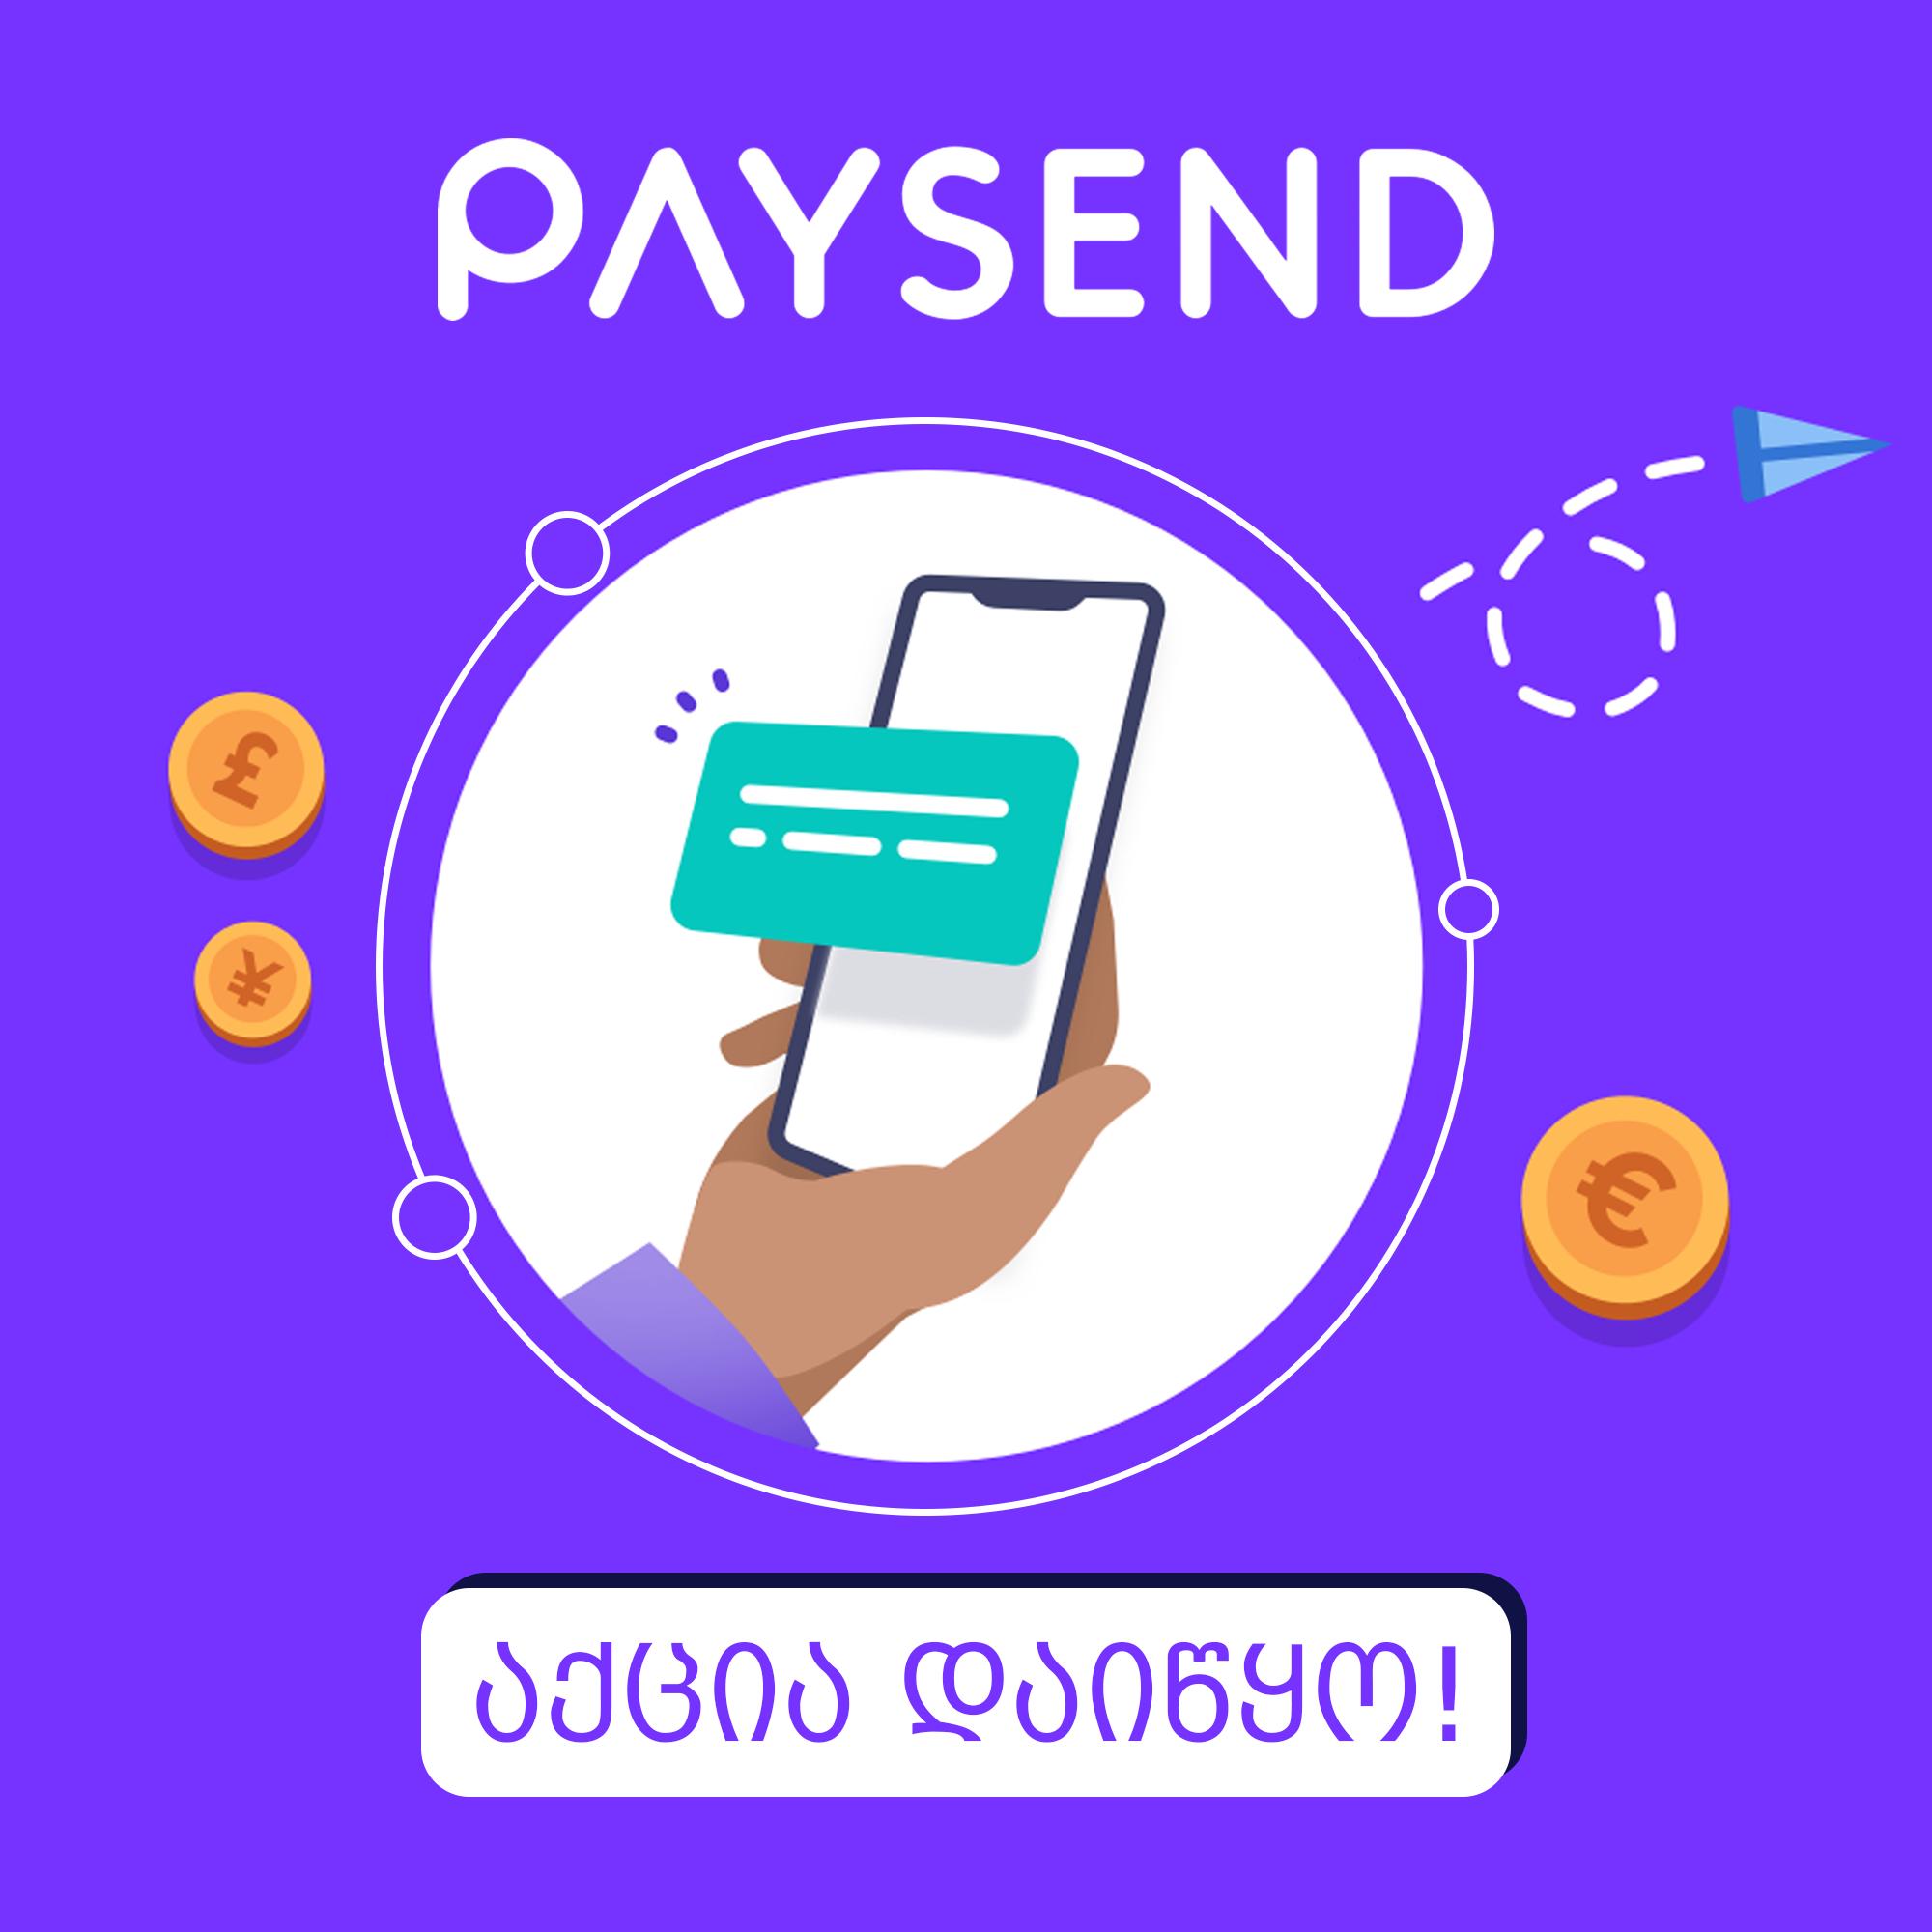 PaySend – ფულადი გადარიცხვა: სწრაფად, მარტივად, იაფად